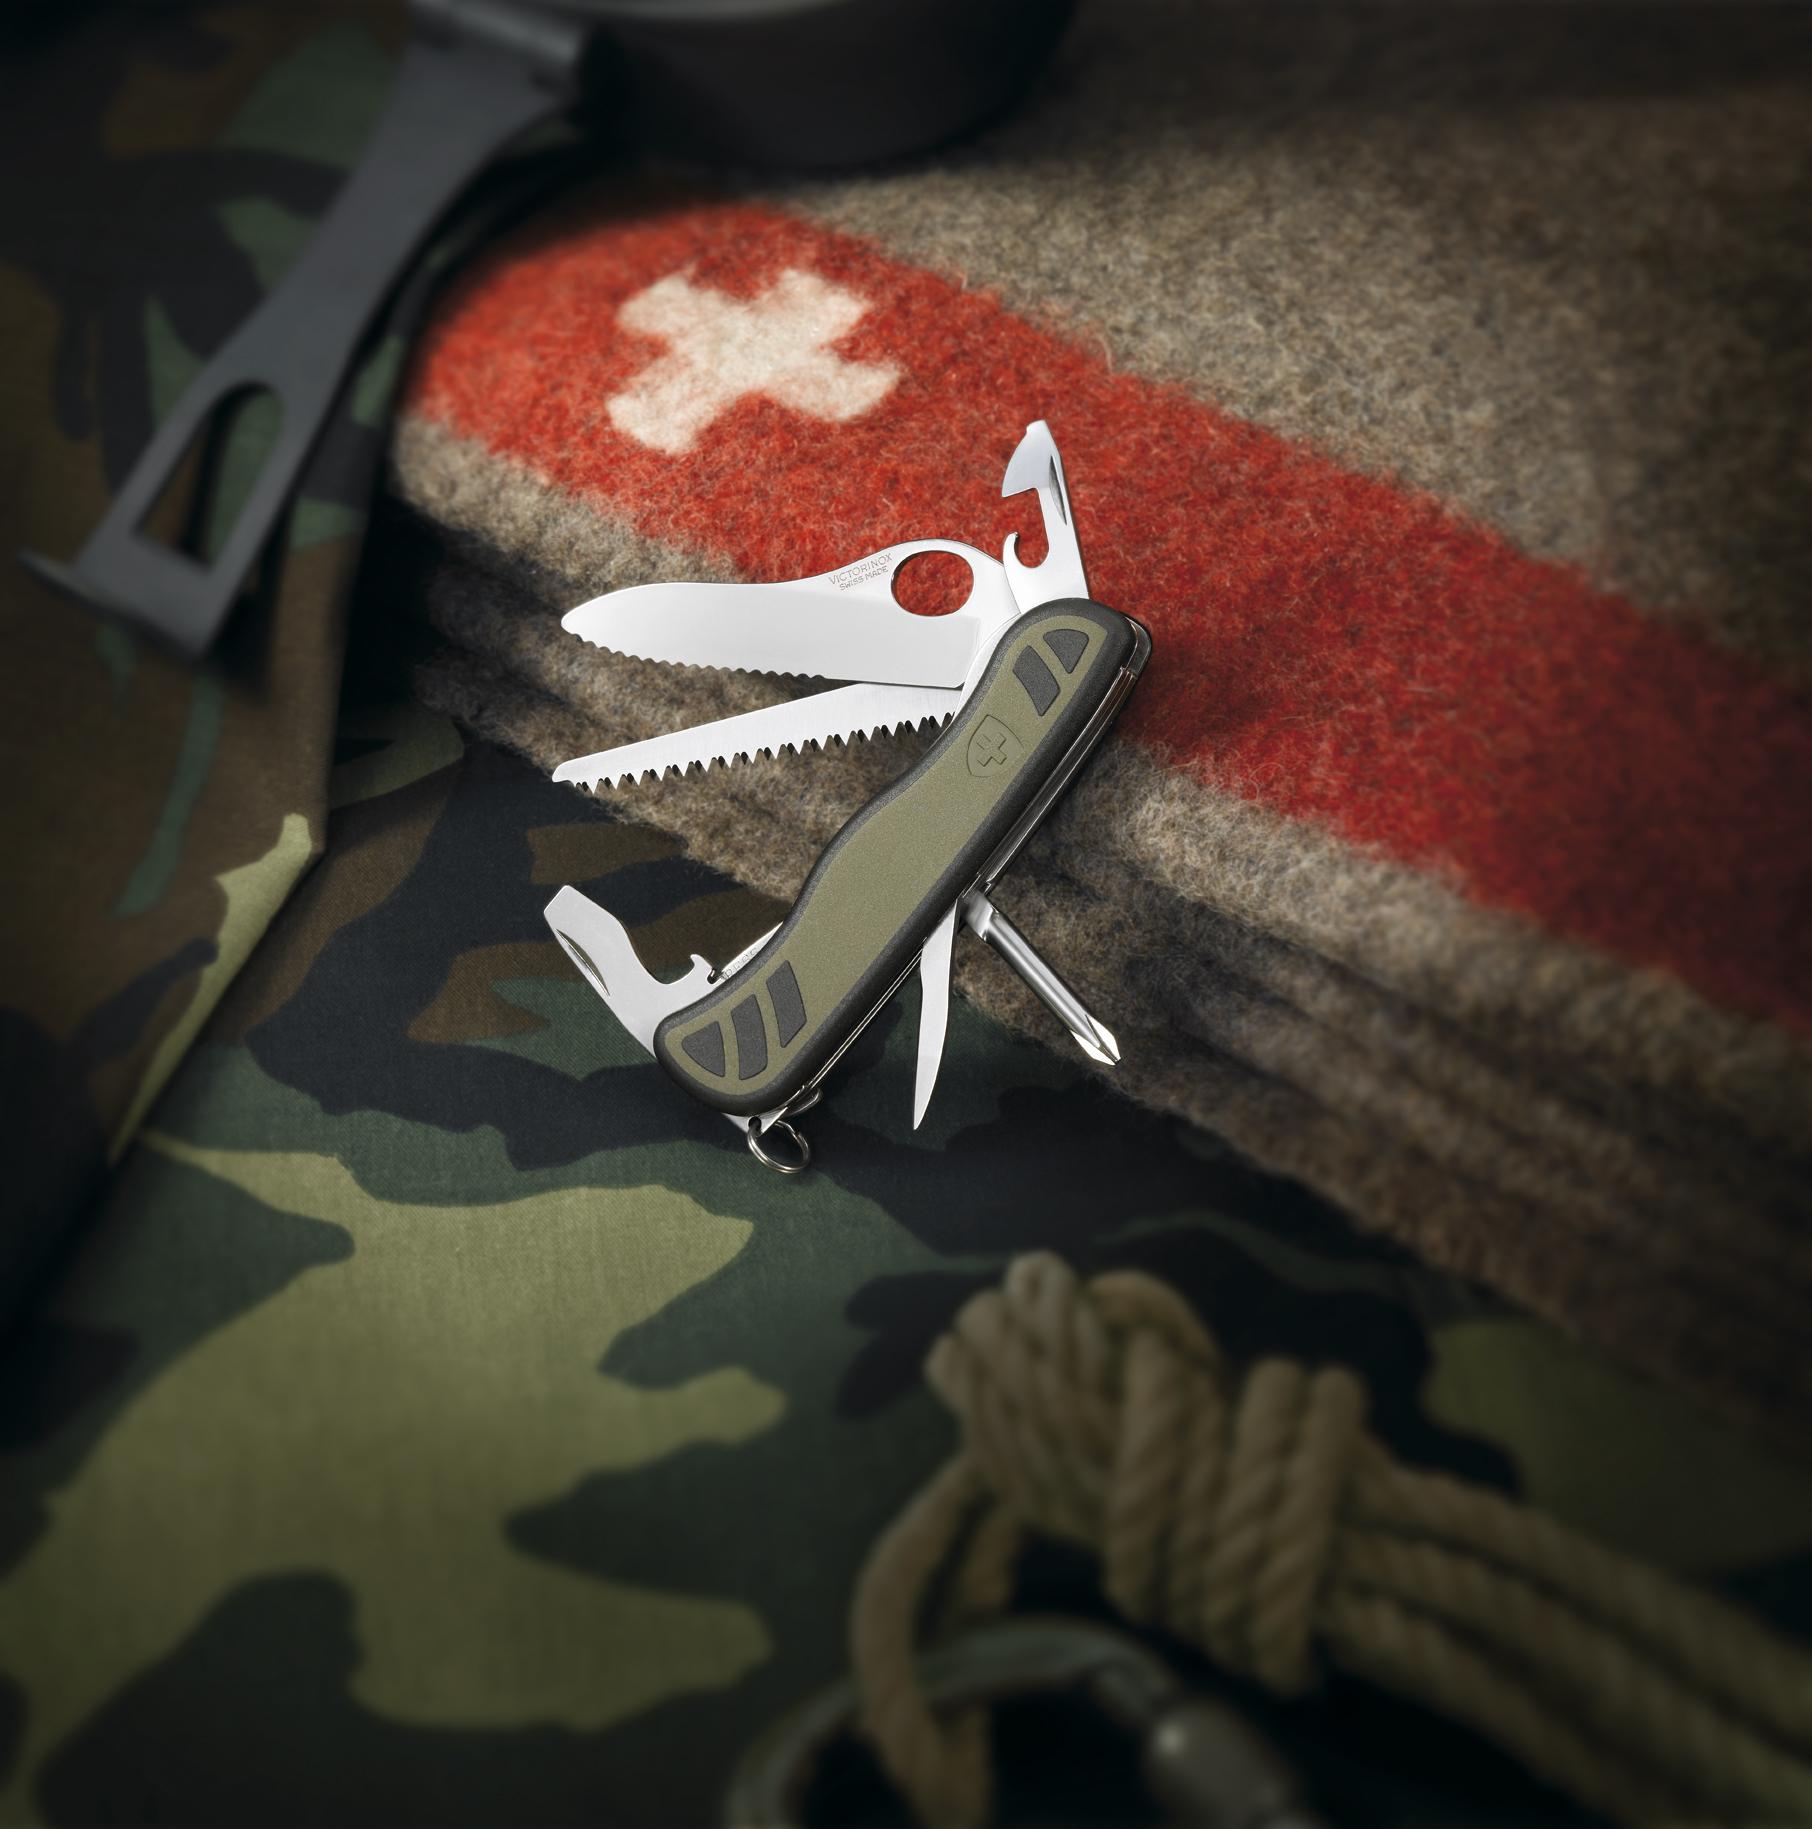 Складной нож Victorinox Military Green, серрейторная заточка, петля для открывания одной рукой (0.8461.MWCH) - Wenger-Victorinox.Ru